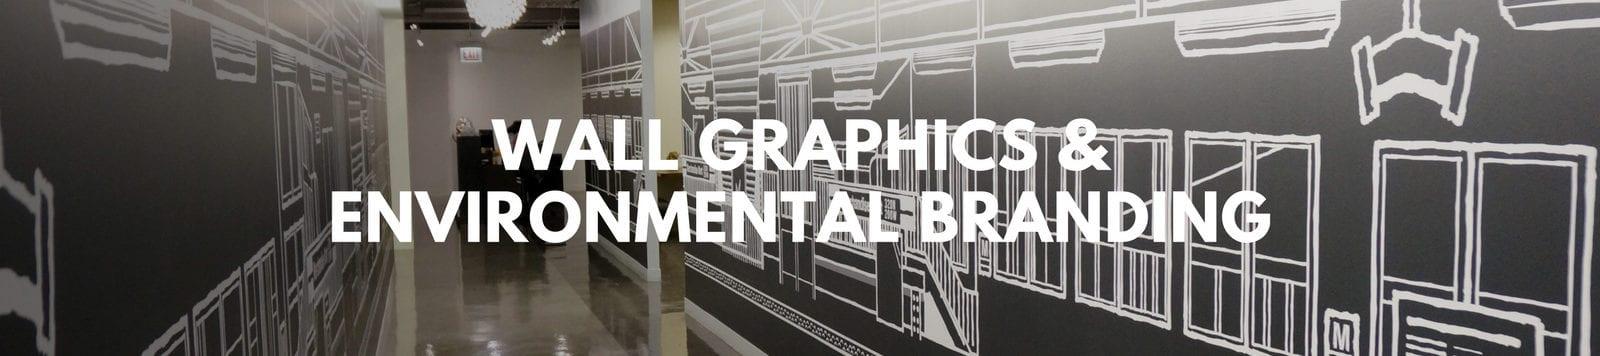 Custom Vinyl Wall Graphics Vinyl Cut Lettering And Decals Cushing Wall Art